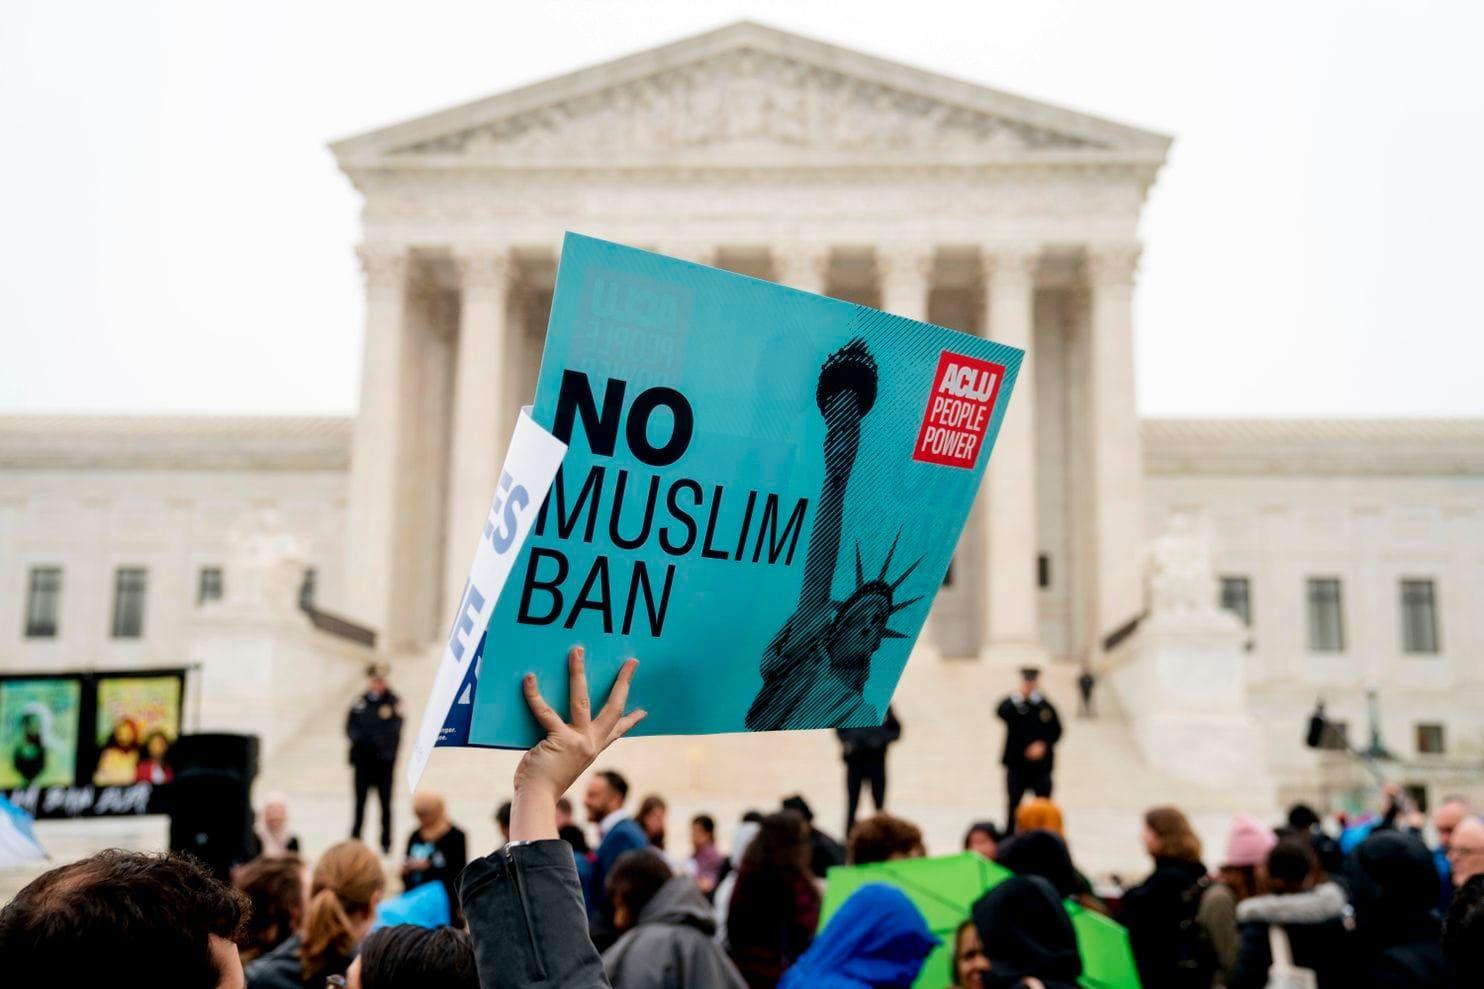 Photo Credit: Andrew Harnik, AP for Washington Post